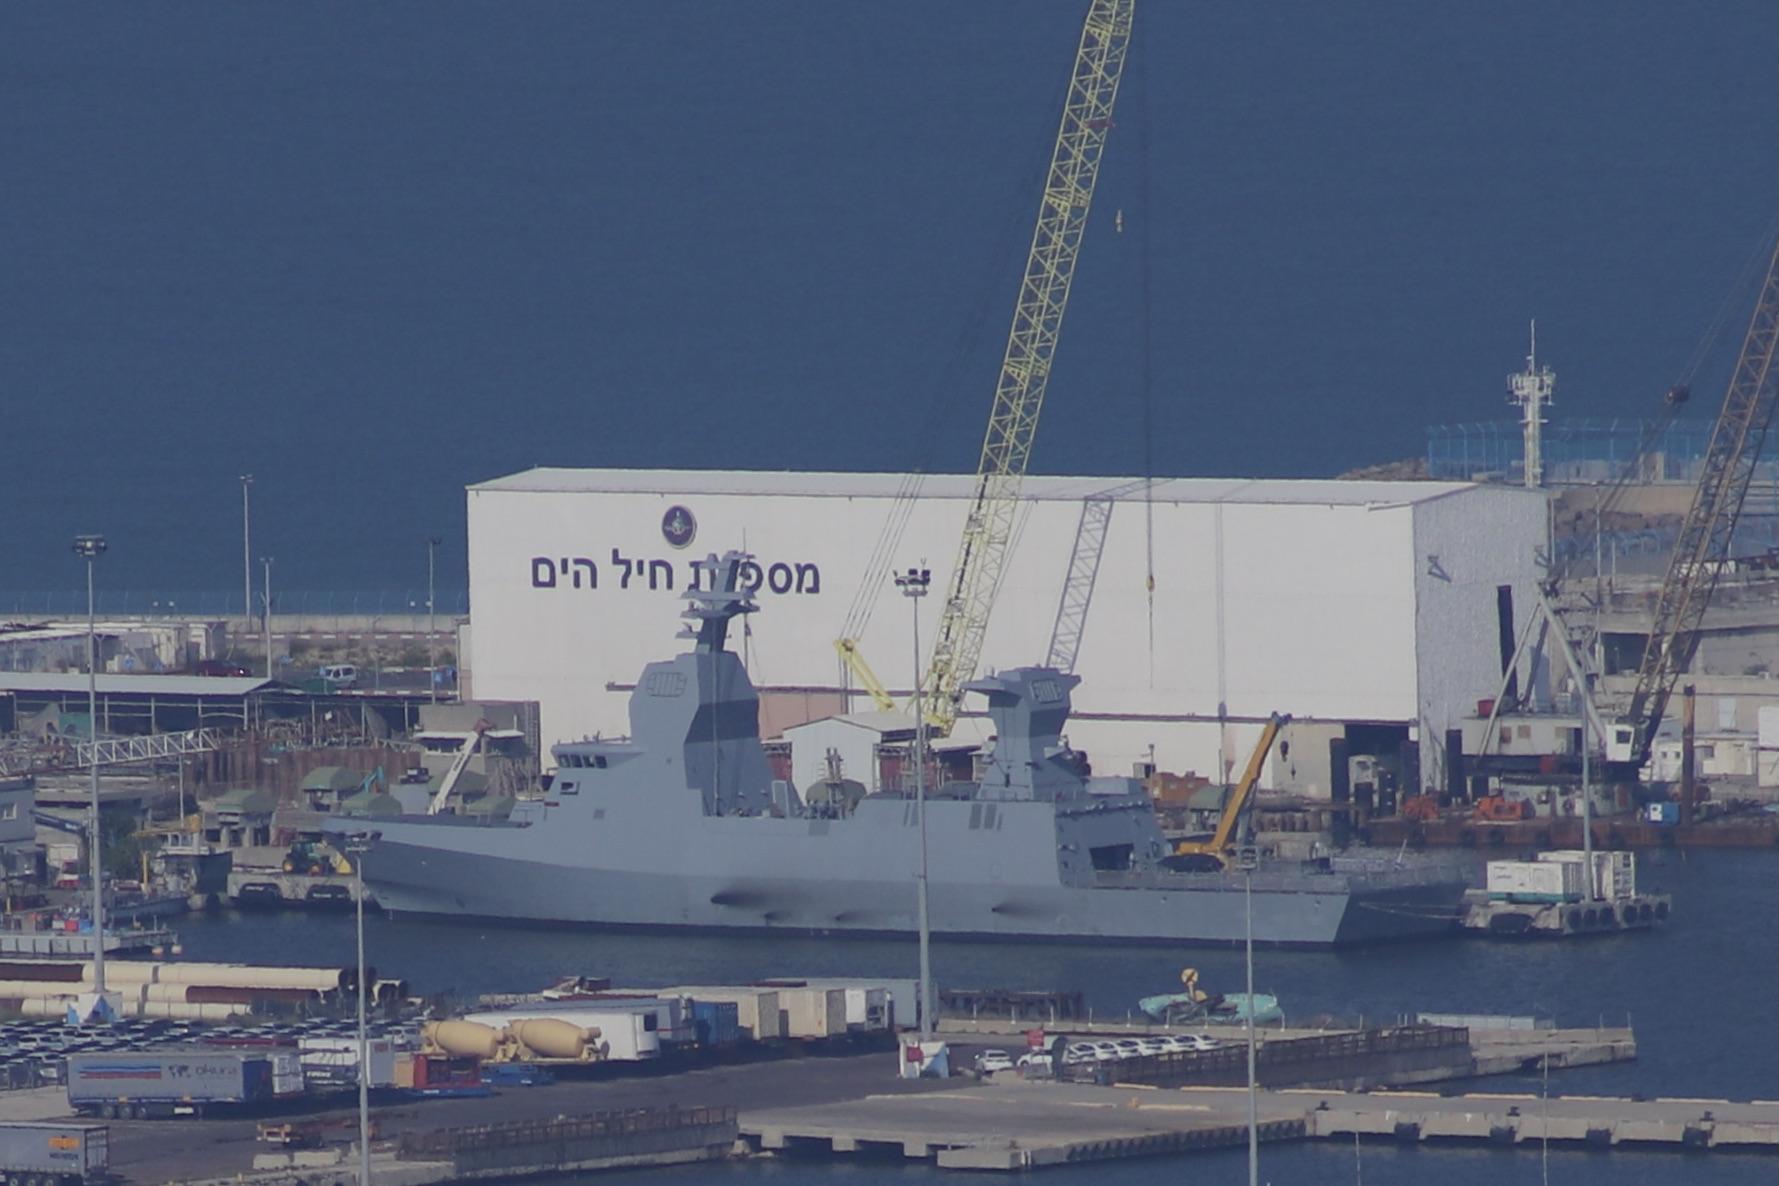 Sa'ar 6-class corvette anchored in the Haifa Port